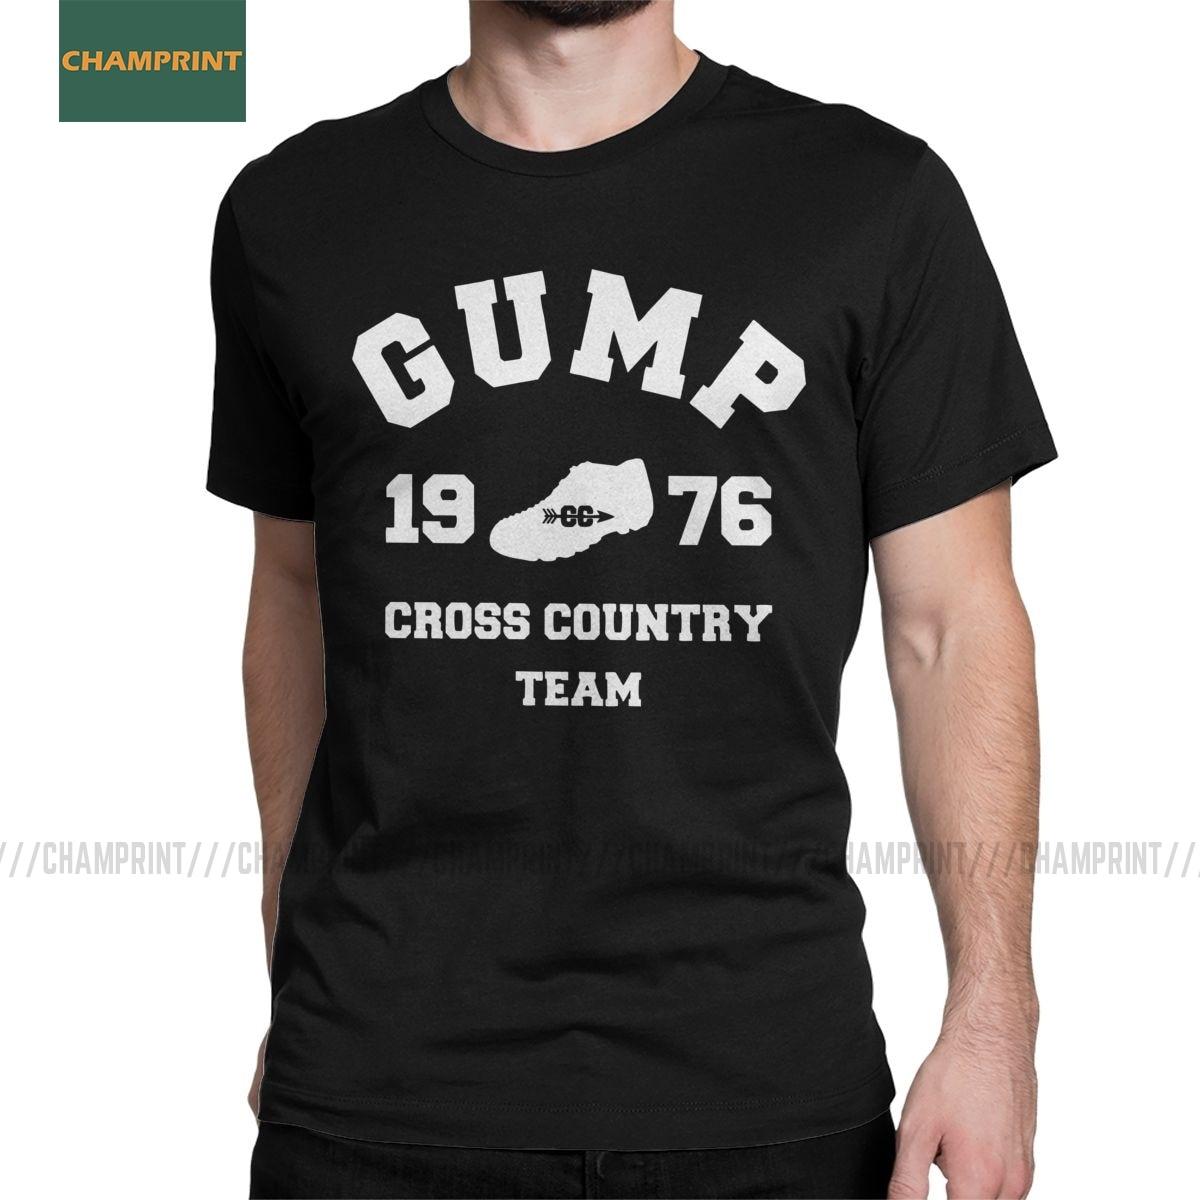 Men Forrest Gump Cross Country Team T Shirt Run Tom Hanks Movie Film Cotton Short Sleeve Round Collar Tees New Arrival T-Shirts